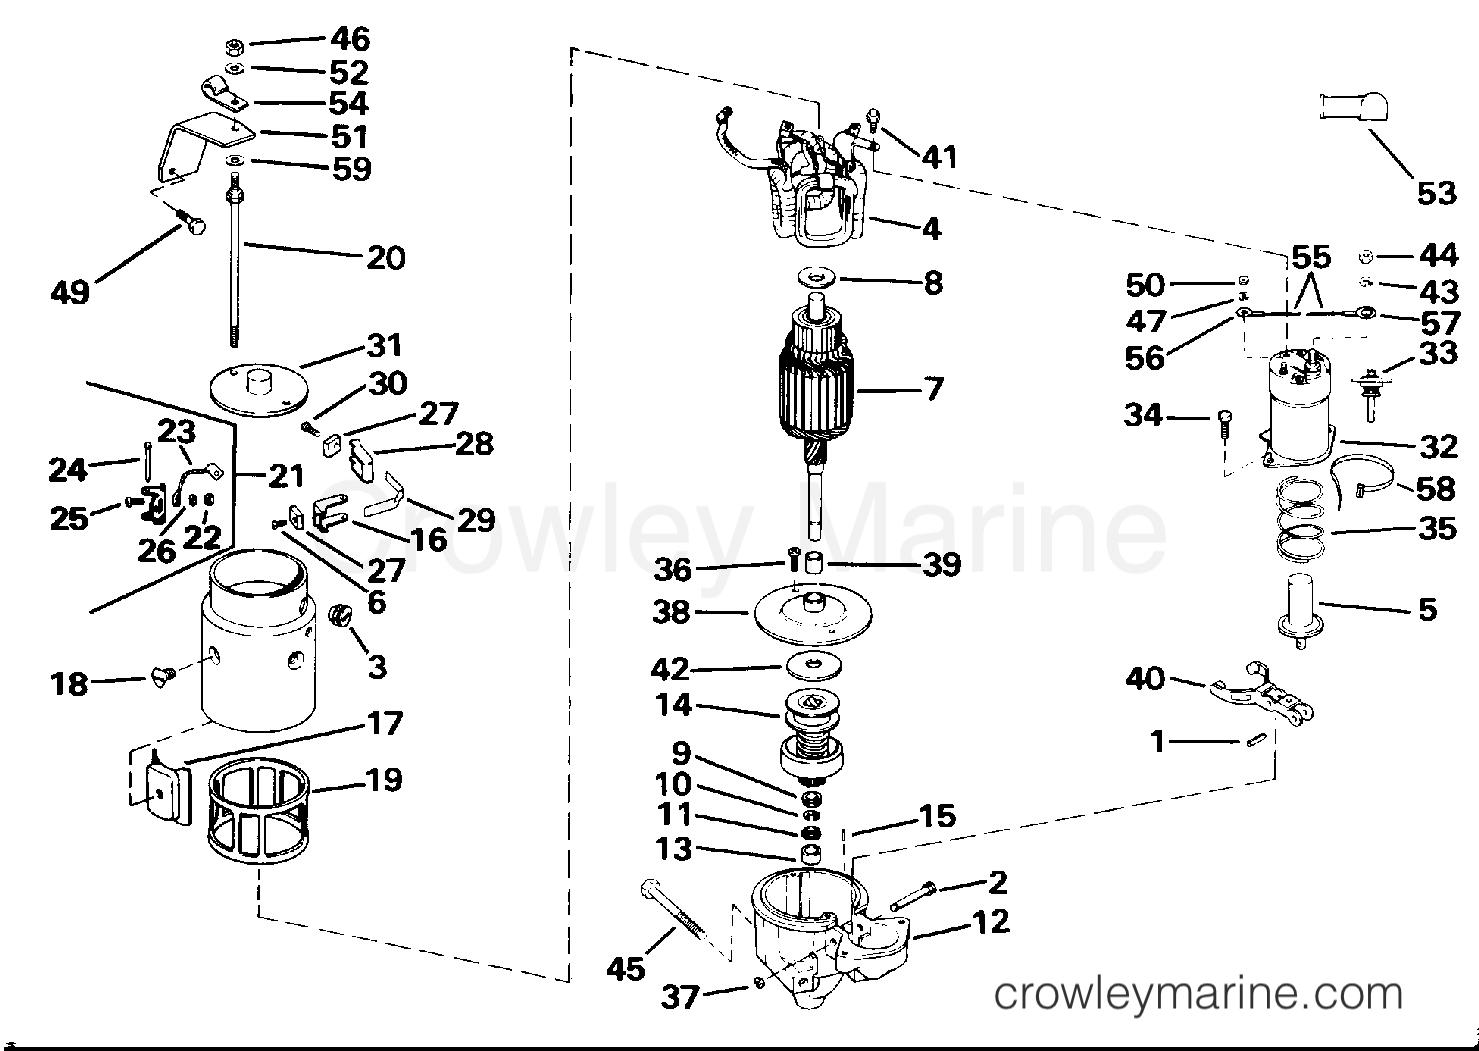 1979 1977 evinrude wiring diagram   wiring diagram database on 1988 evinrude  wiring diagram, 1979 evinrude